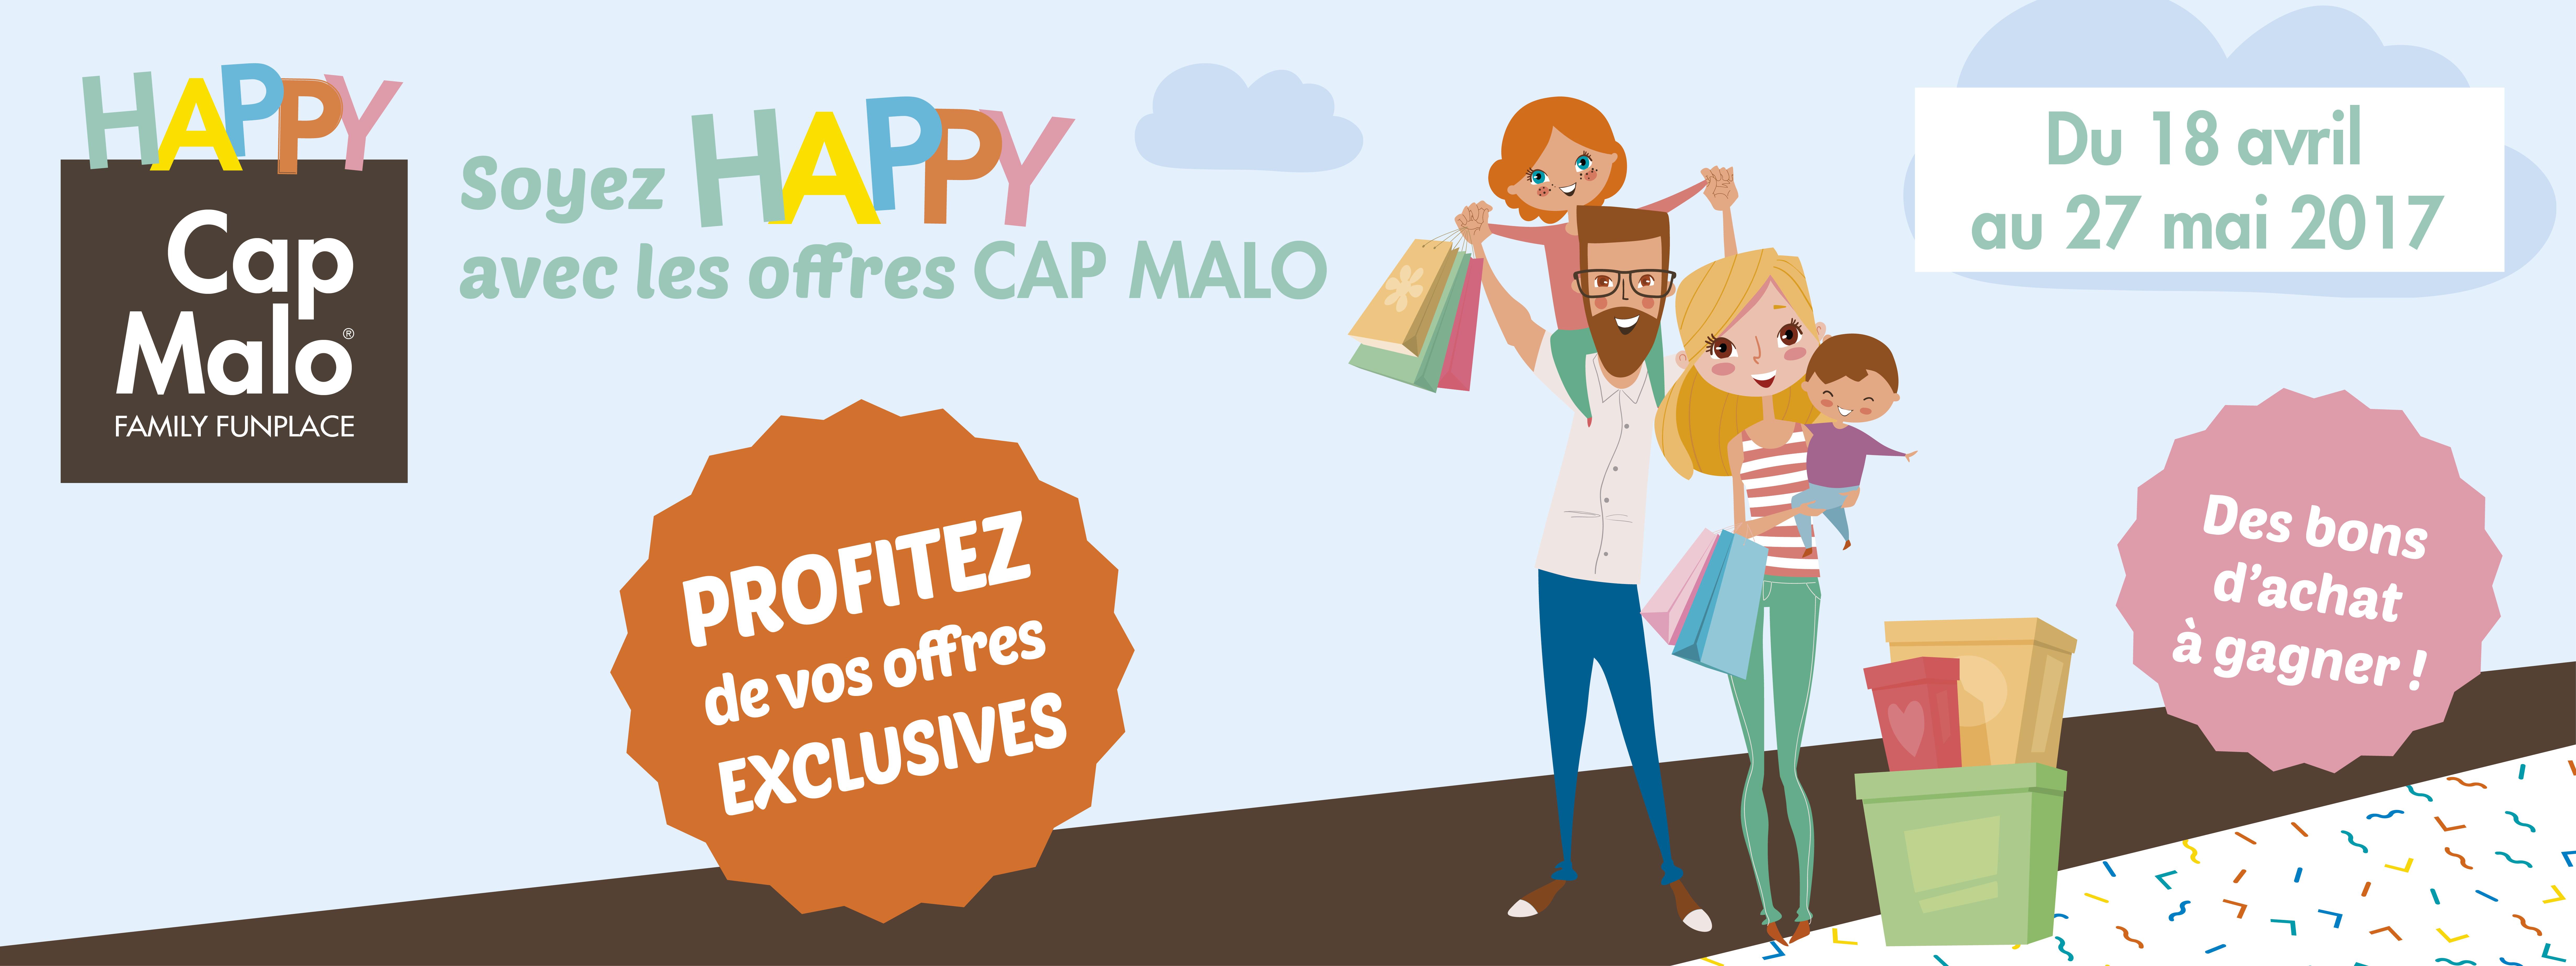 Soyez HAPPY avec Cap Malo !